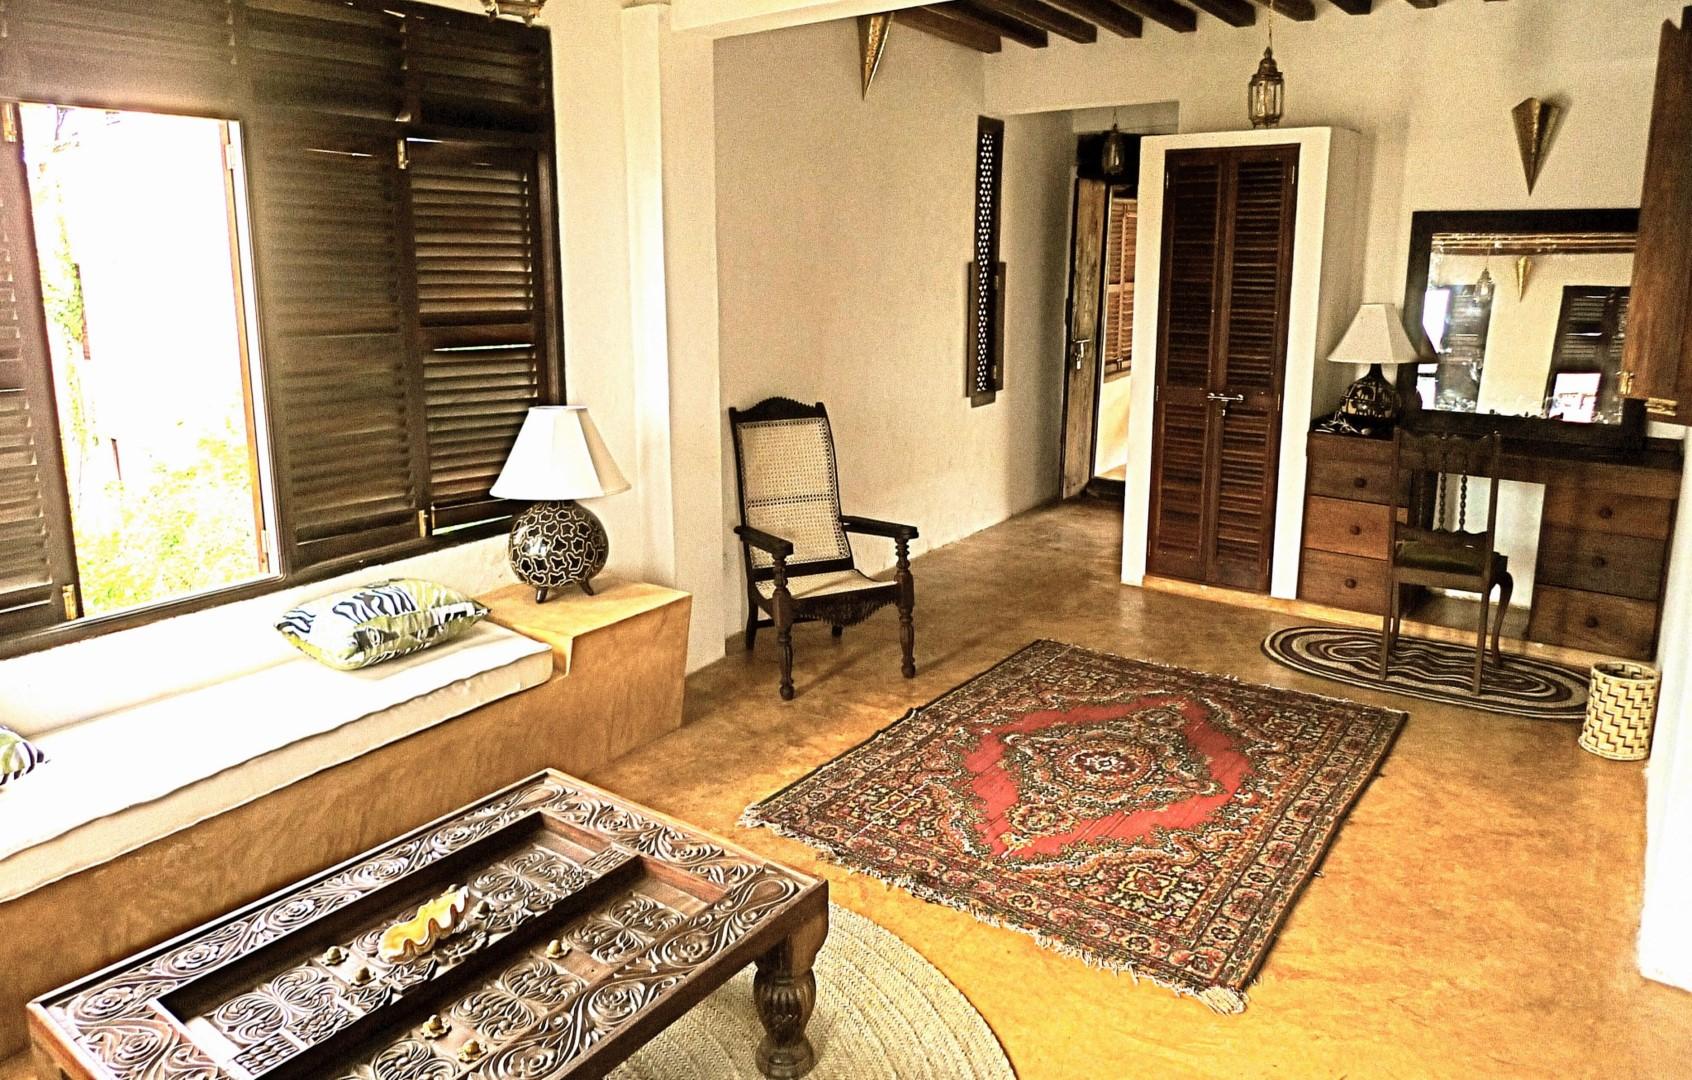 Suite sitting area with door to balcony day-room